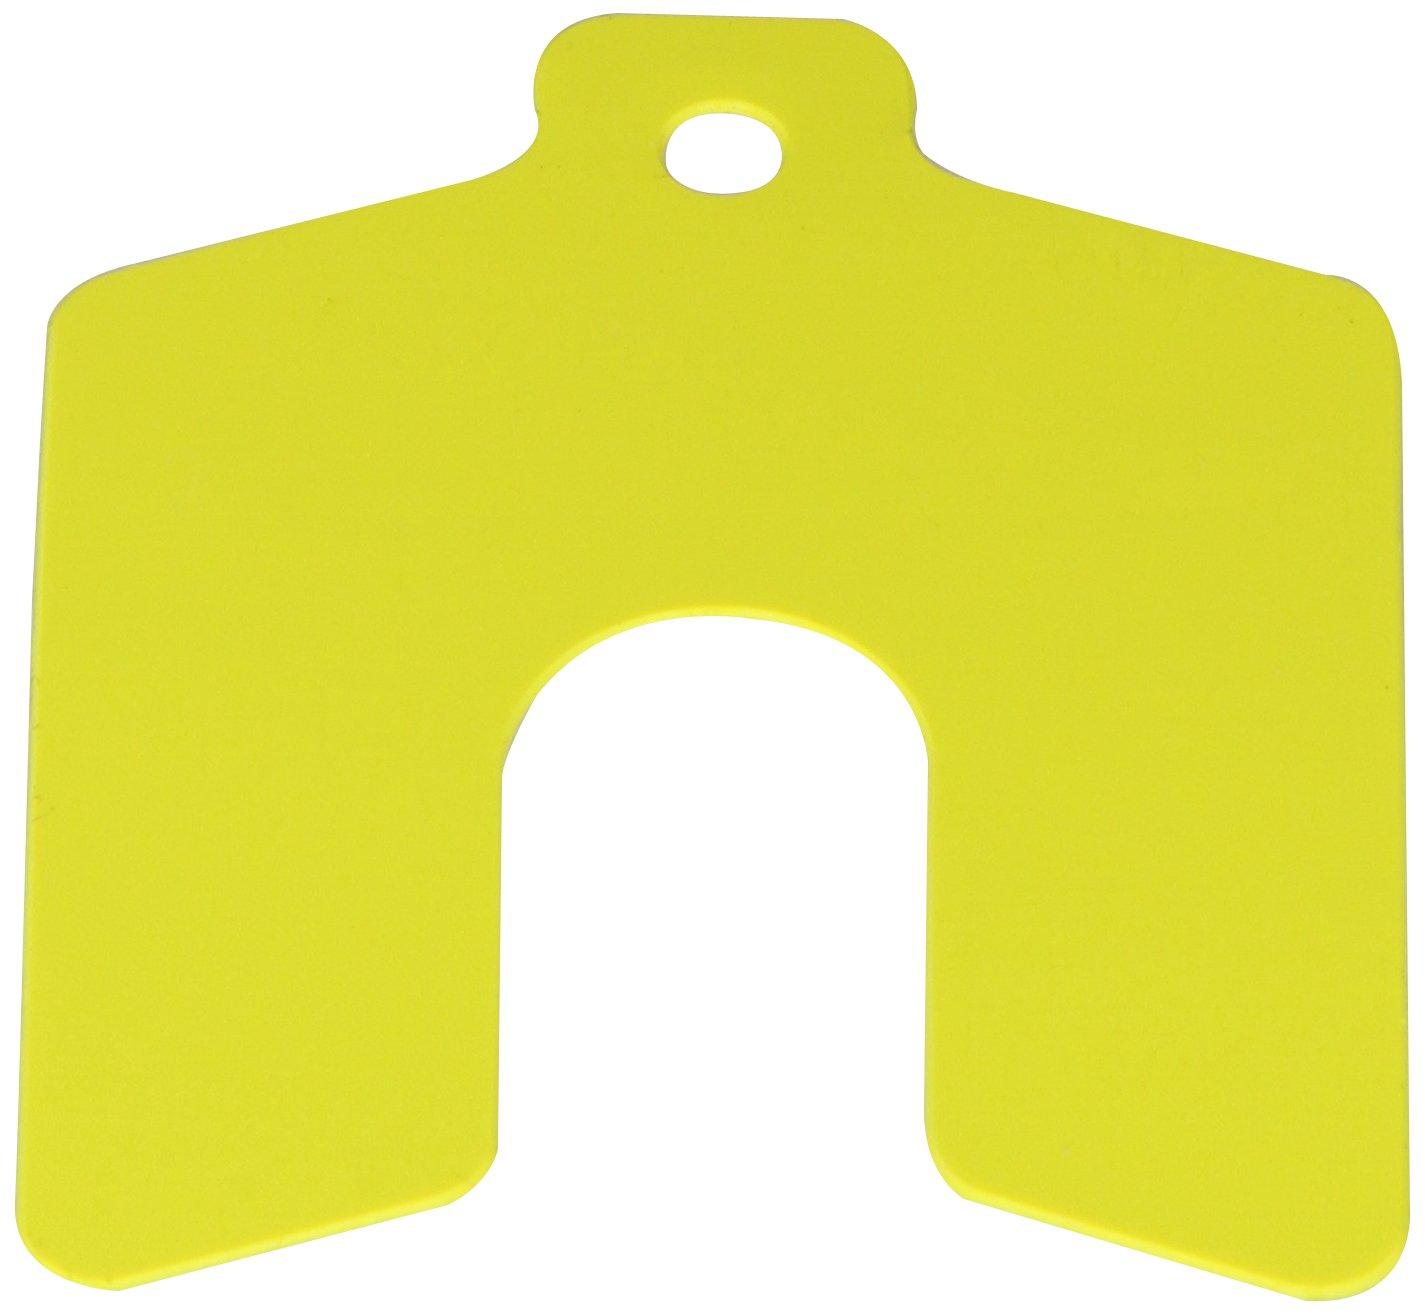 PVC (Polyvinyl Chloride) Slotted Shim, Yellow, 0.020